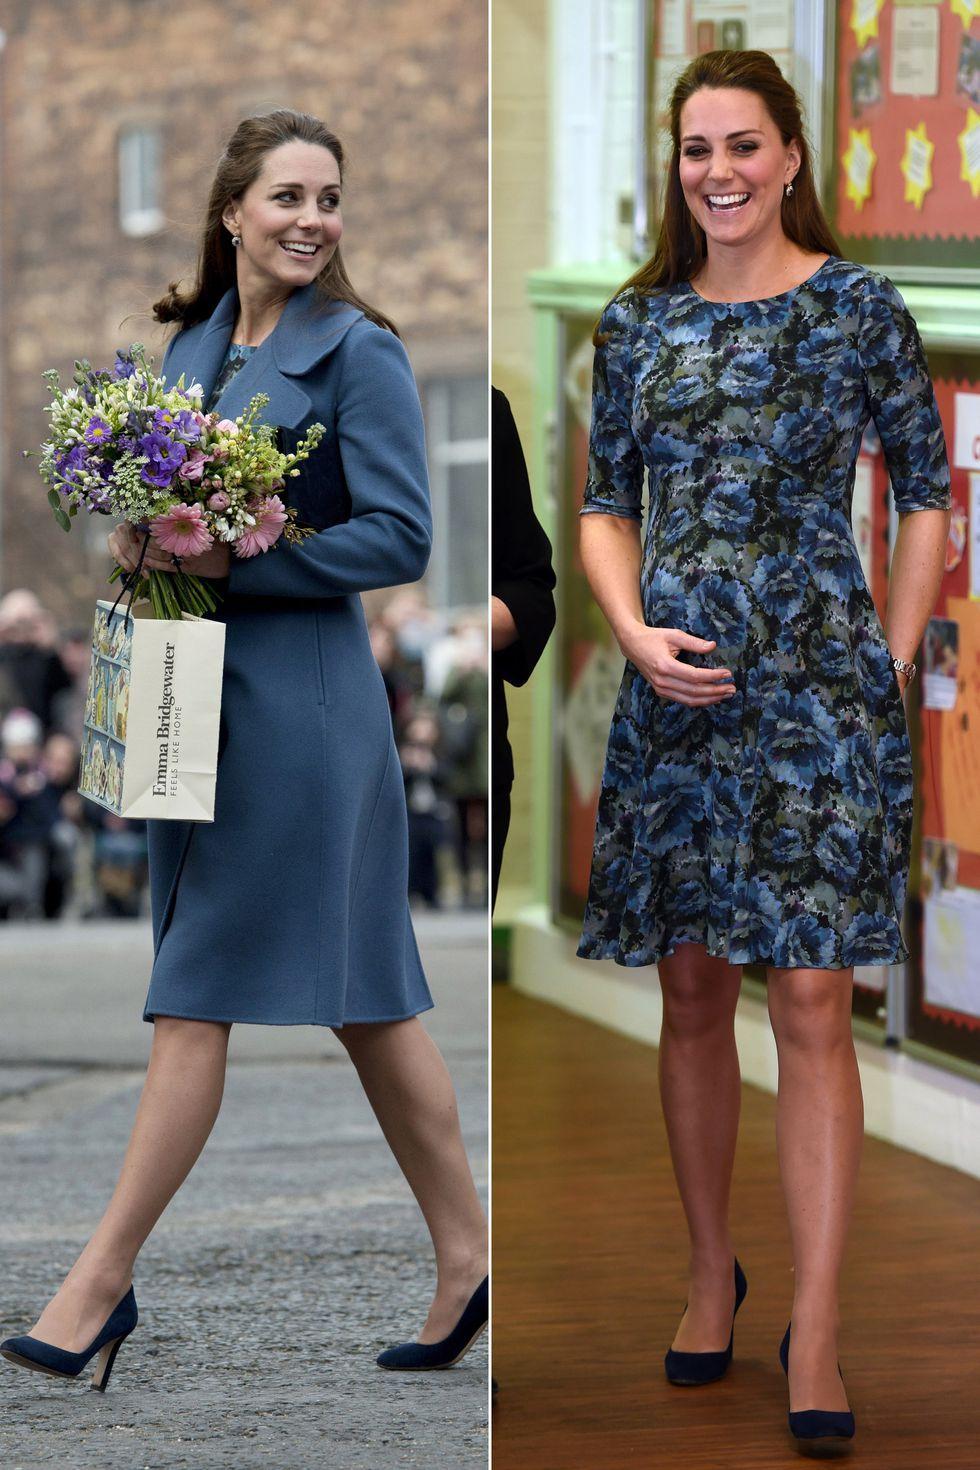 ed97f123748b87 50 of Kate Middleton's Best Maternity Looks | Duchess of Cambridge ...